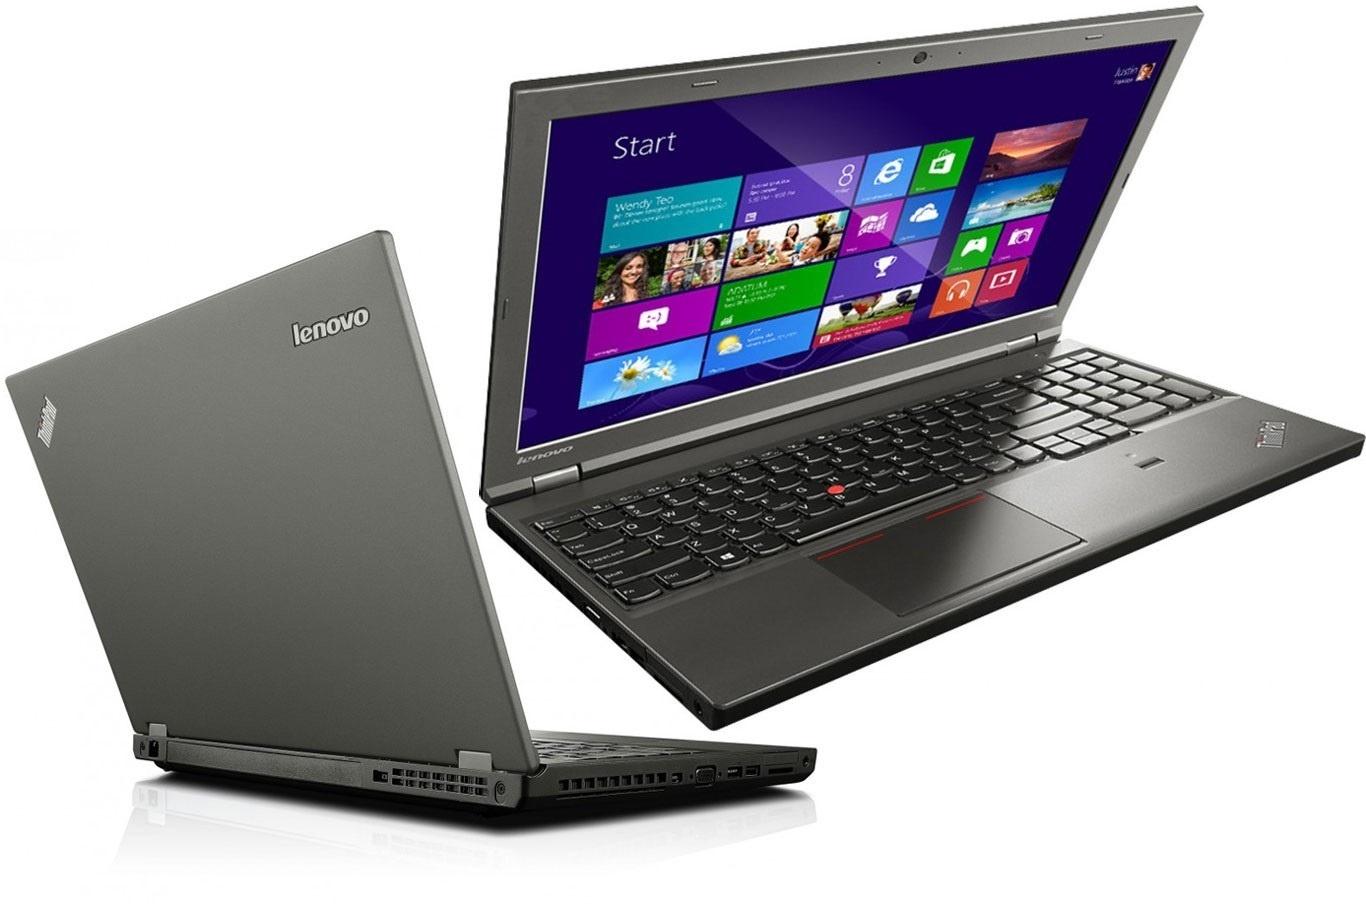 Lenovo Thinkpad W541  pantone color calibrator